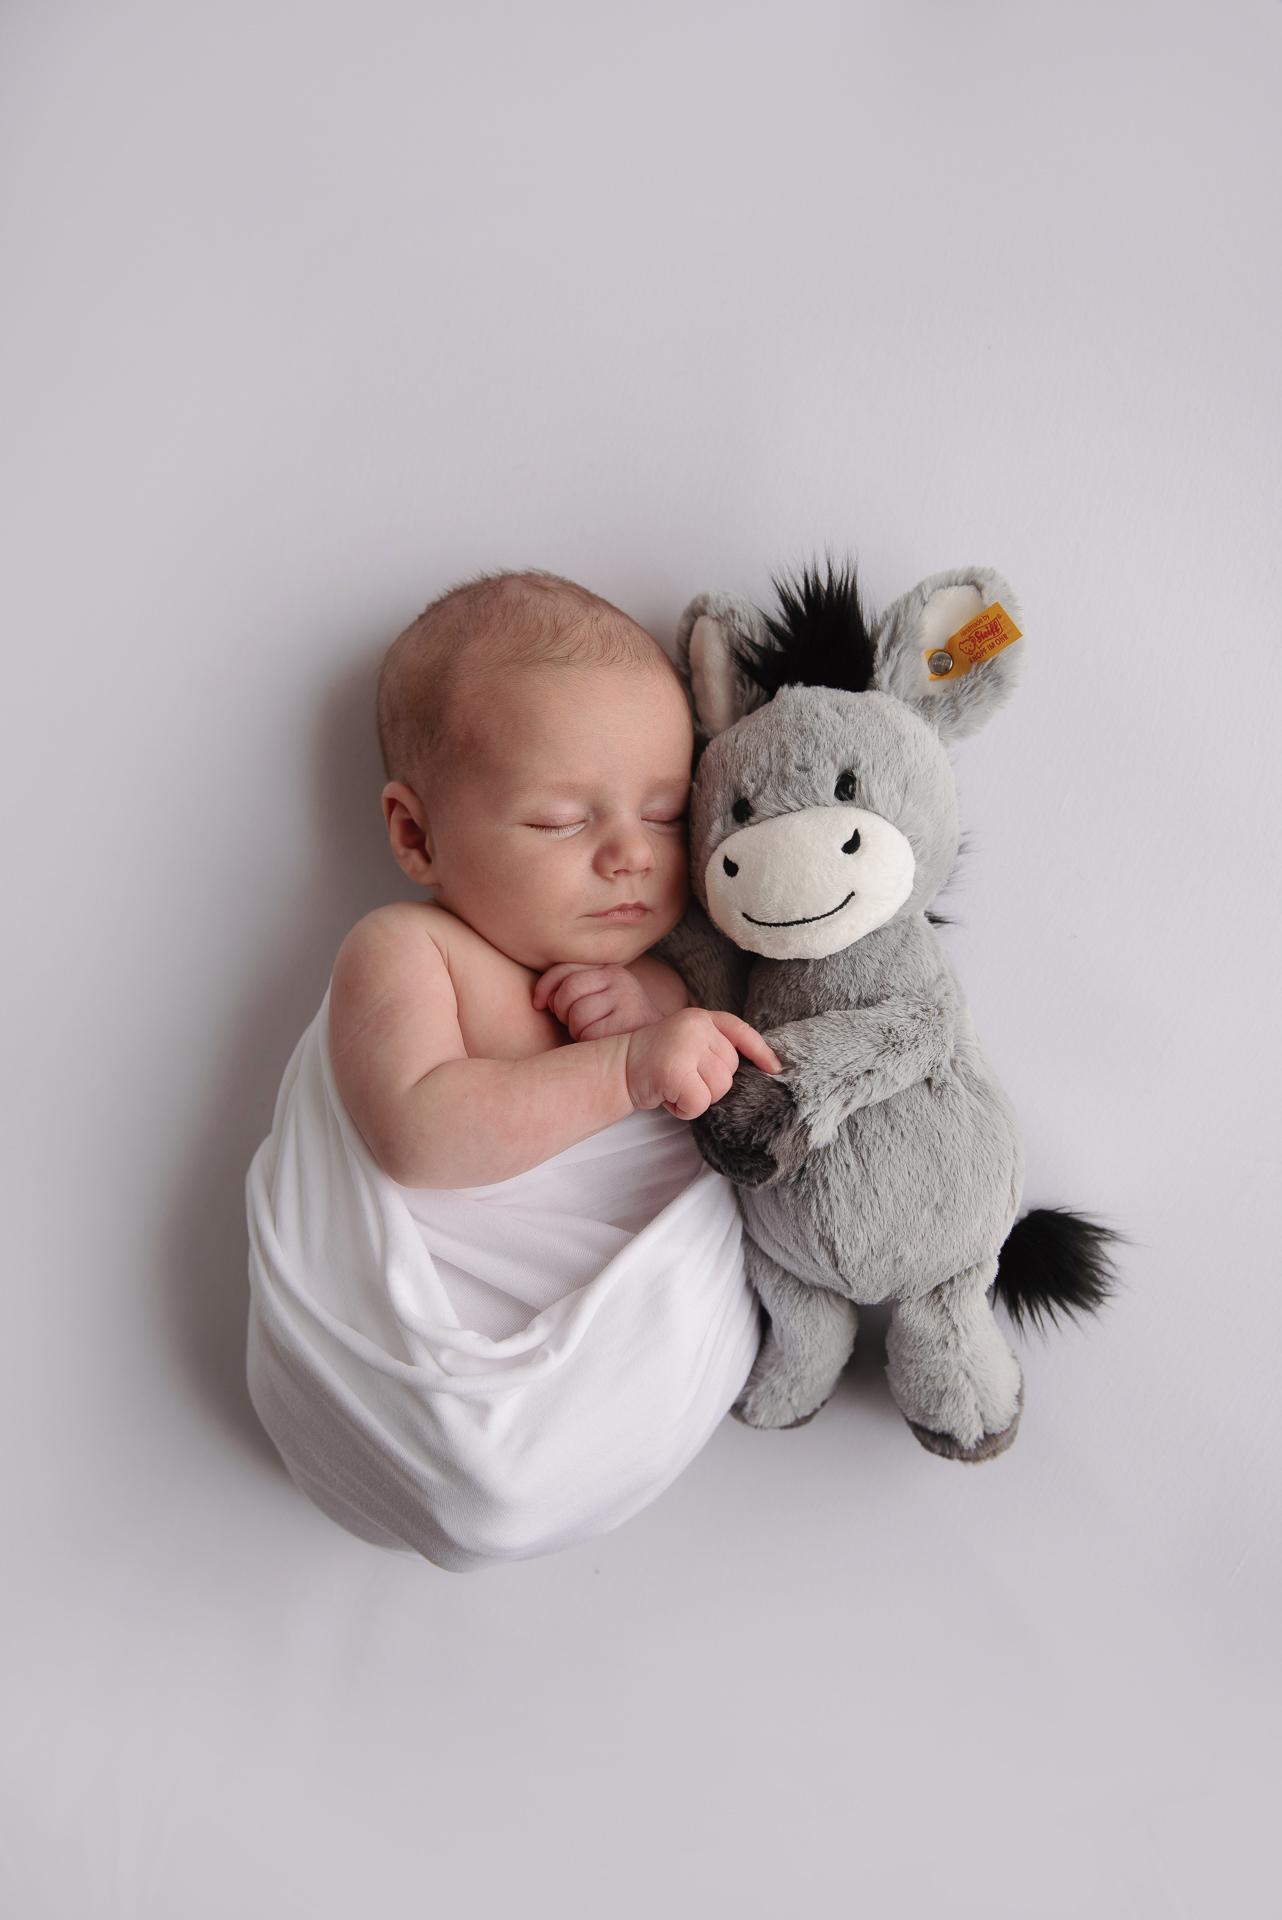 Newborn Baby and Cuddly Toy